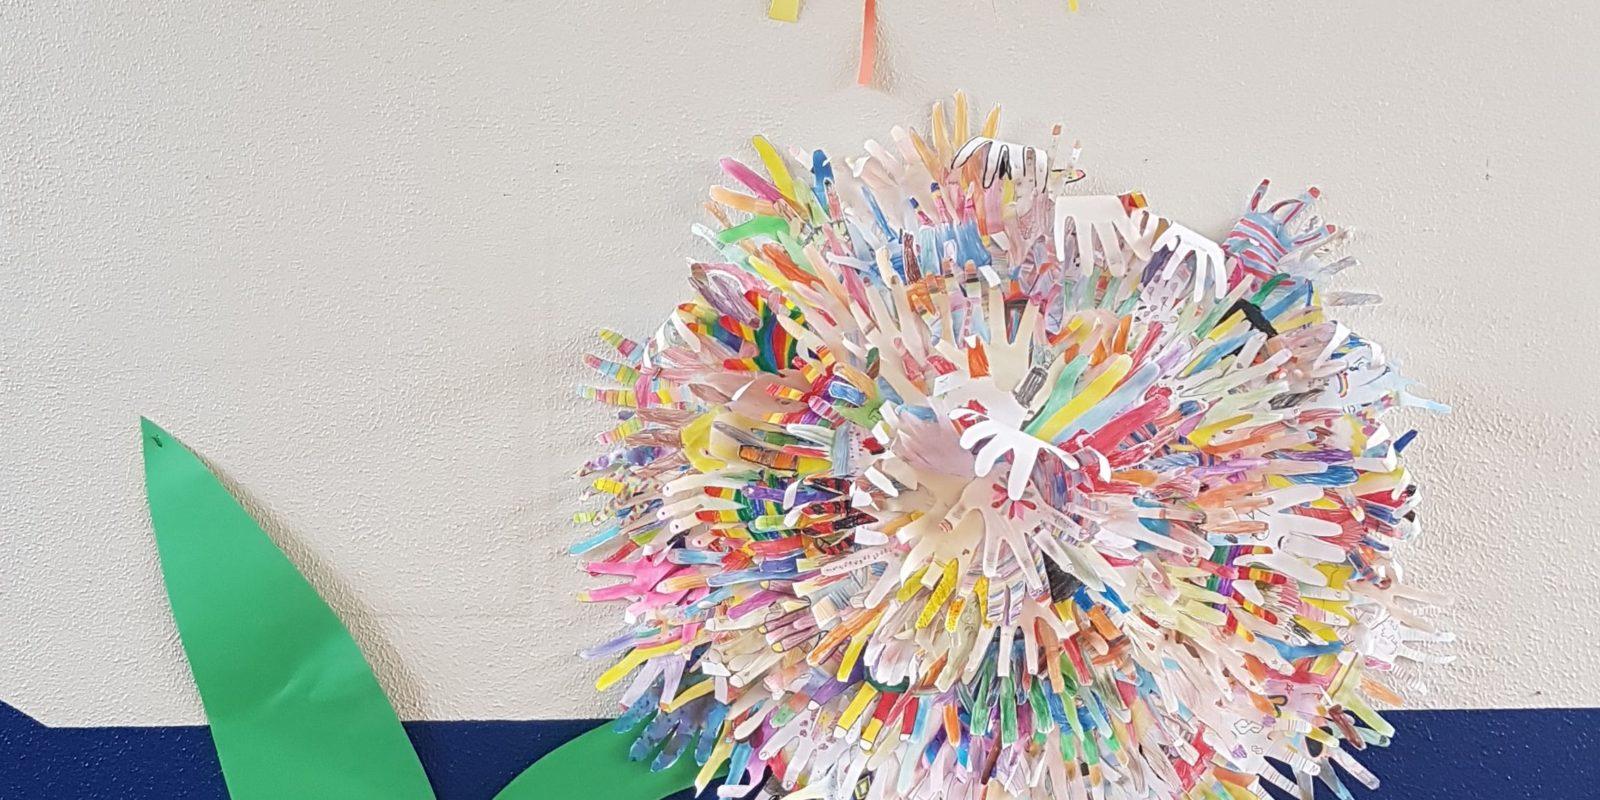 Kreative Gemeinschaftsarbeit der Josefschule